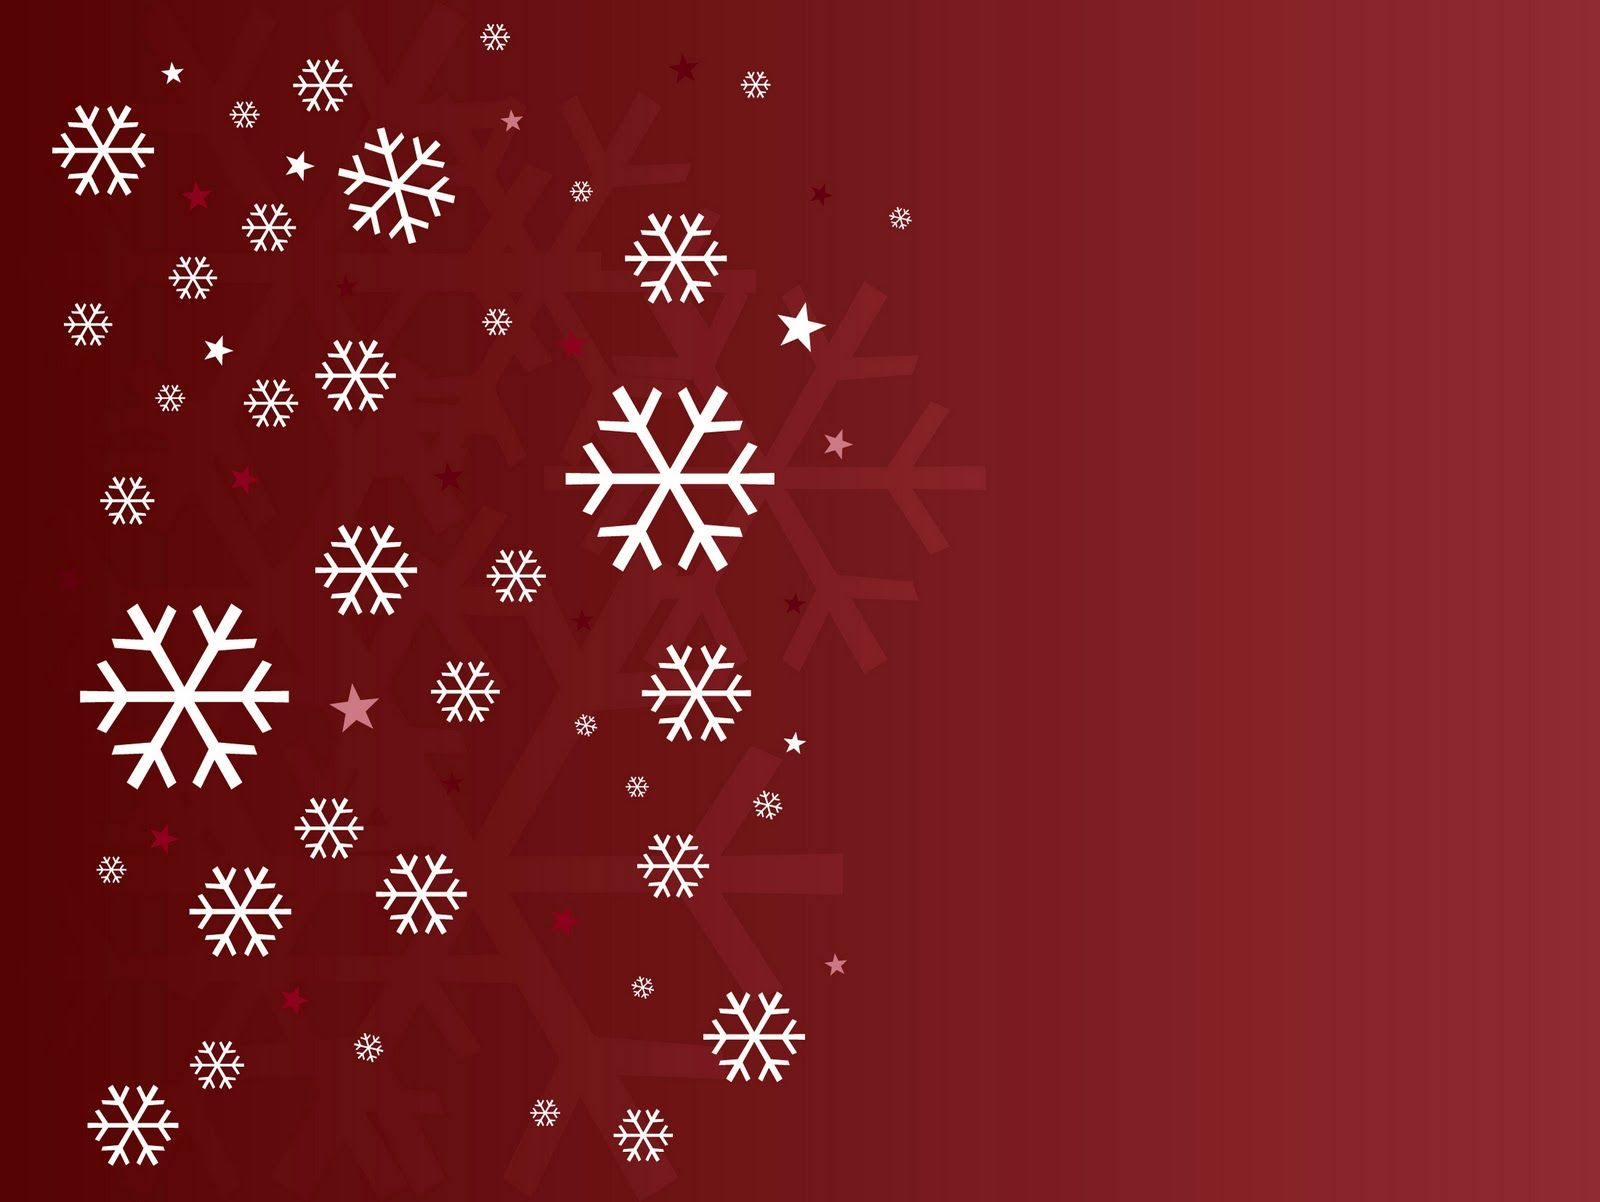 Fondos Pantalla Animados De Navidad: Fondos Navideños Animados Para Protector De Pantalla 8 HD